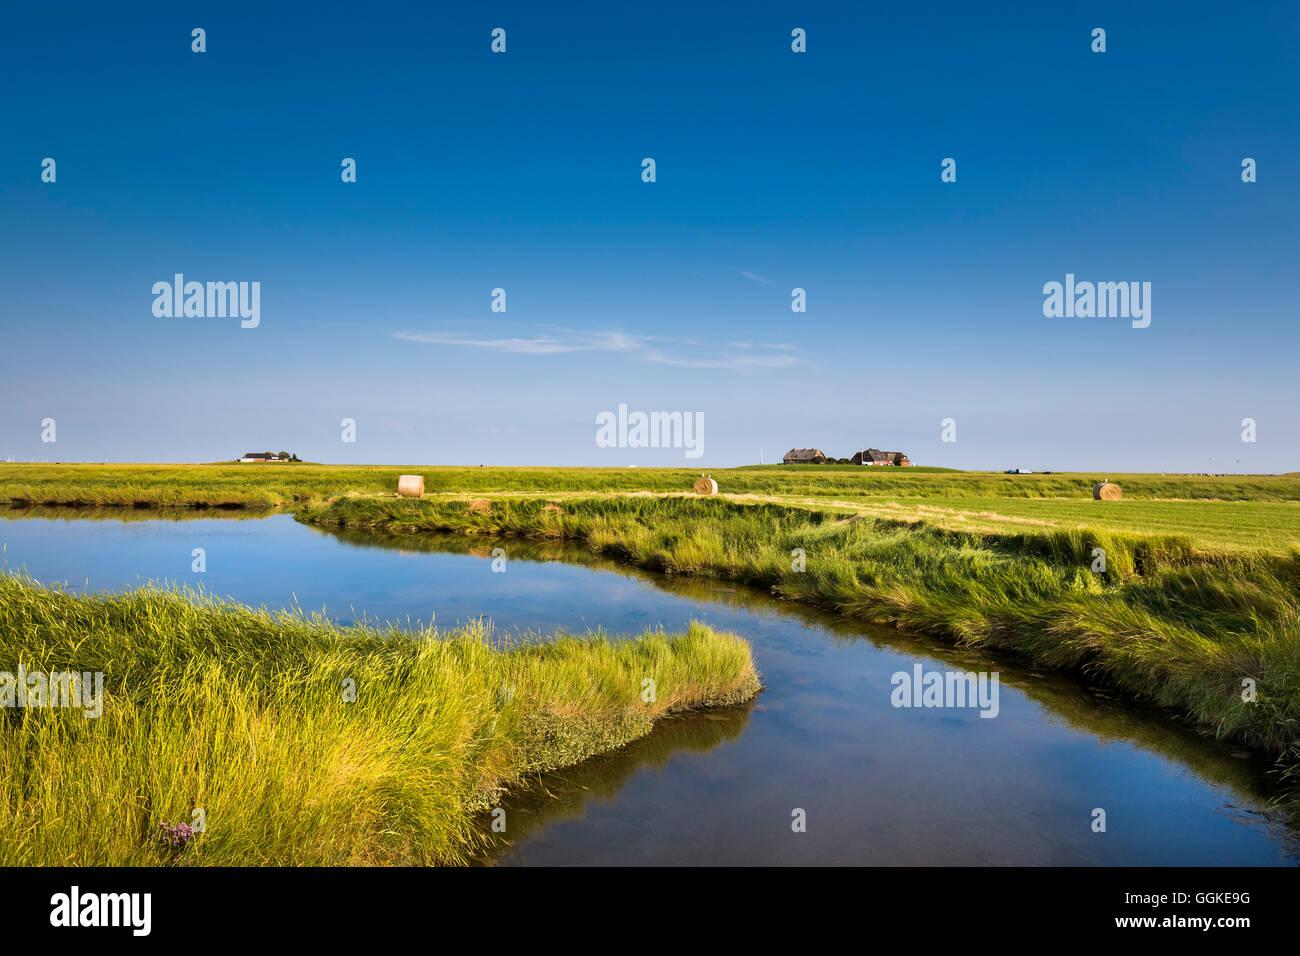 Salt marsh and dwelling mound, Hallig Langeness, North Frisian Islands, Schleswig-Holstein, Germany - Stock Image